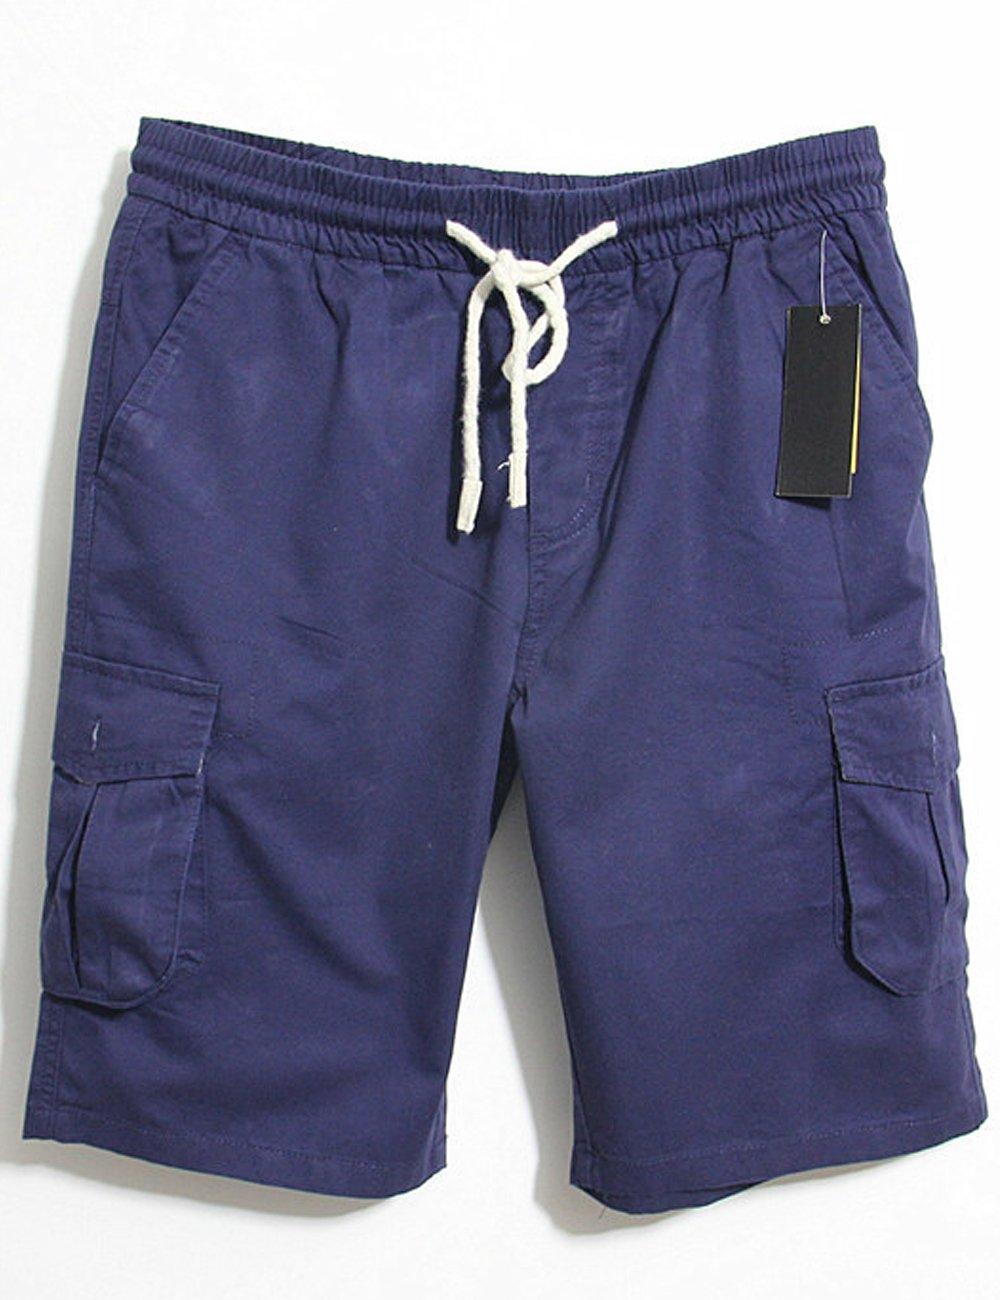 Men's 100% Cotton Summer Casual Cargo Shorts with Elastic Waist Drawstring (Waist 37,Navy)